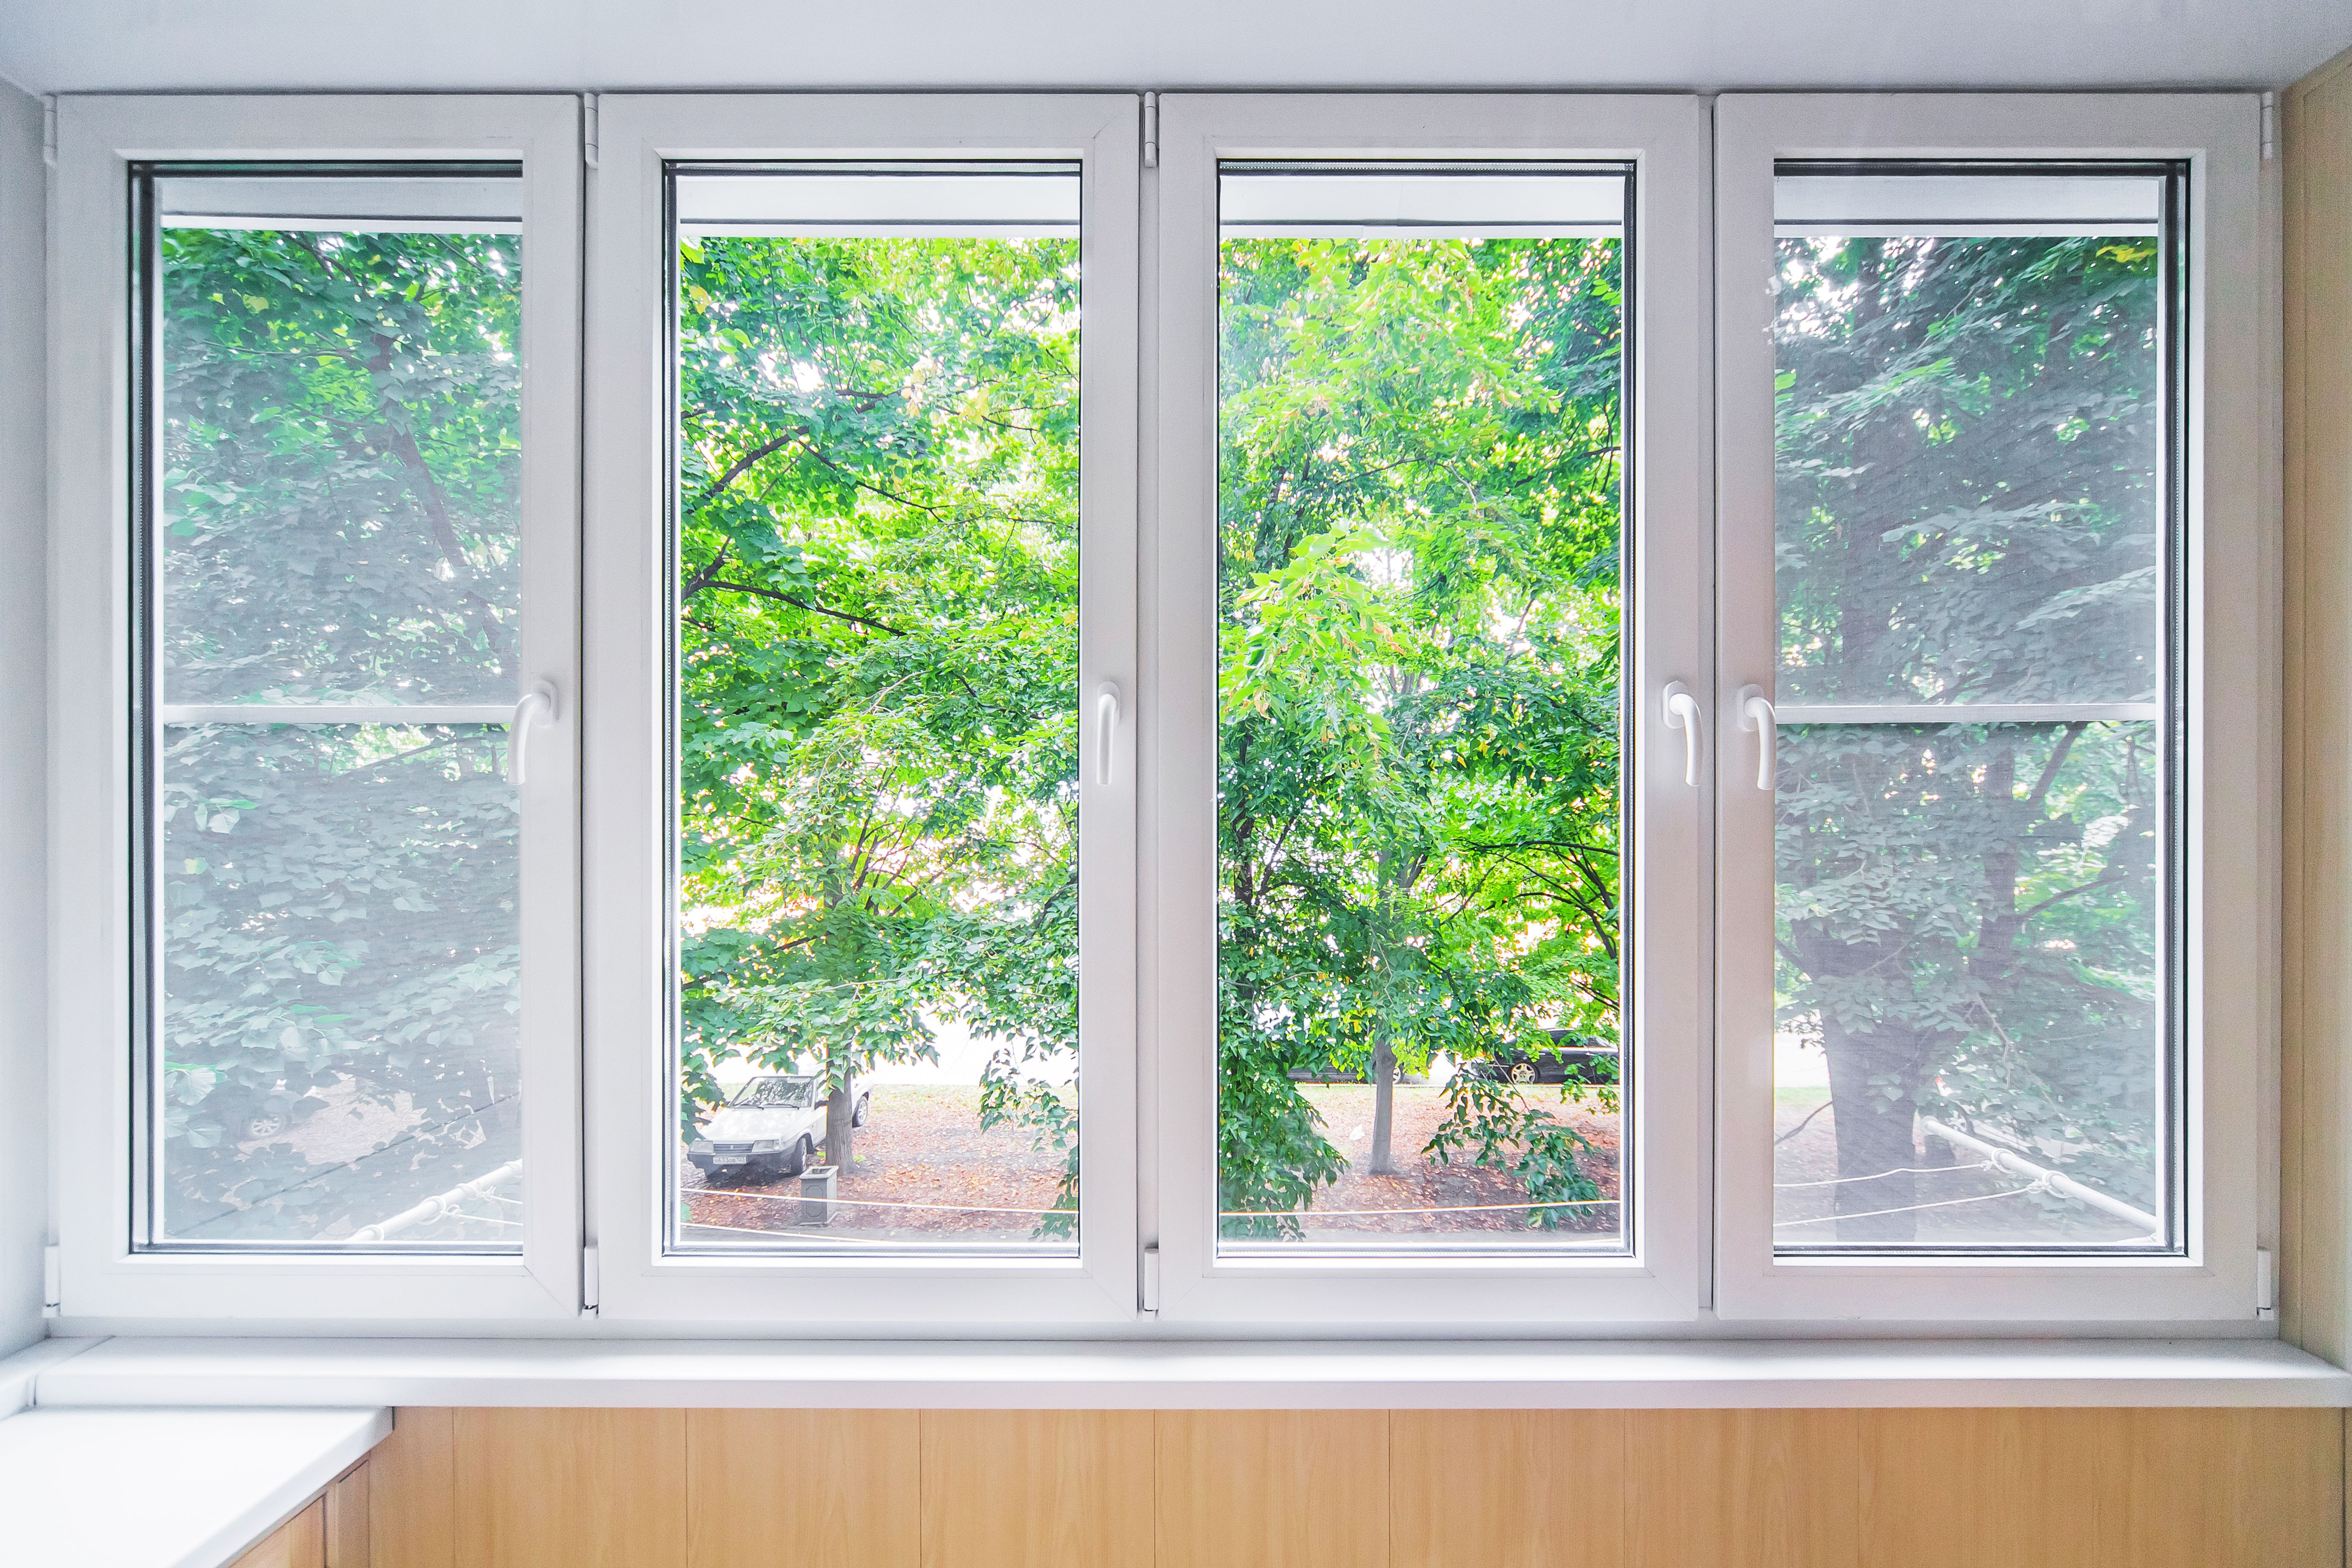 Best Replacement Windows Best Replacement Windows Fiberglass Windows Window Brands